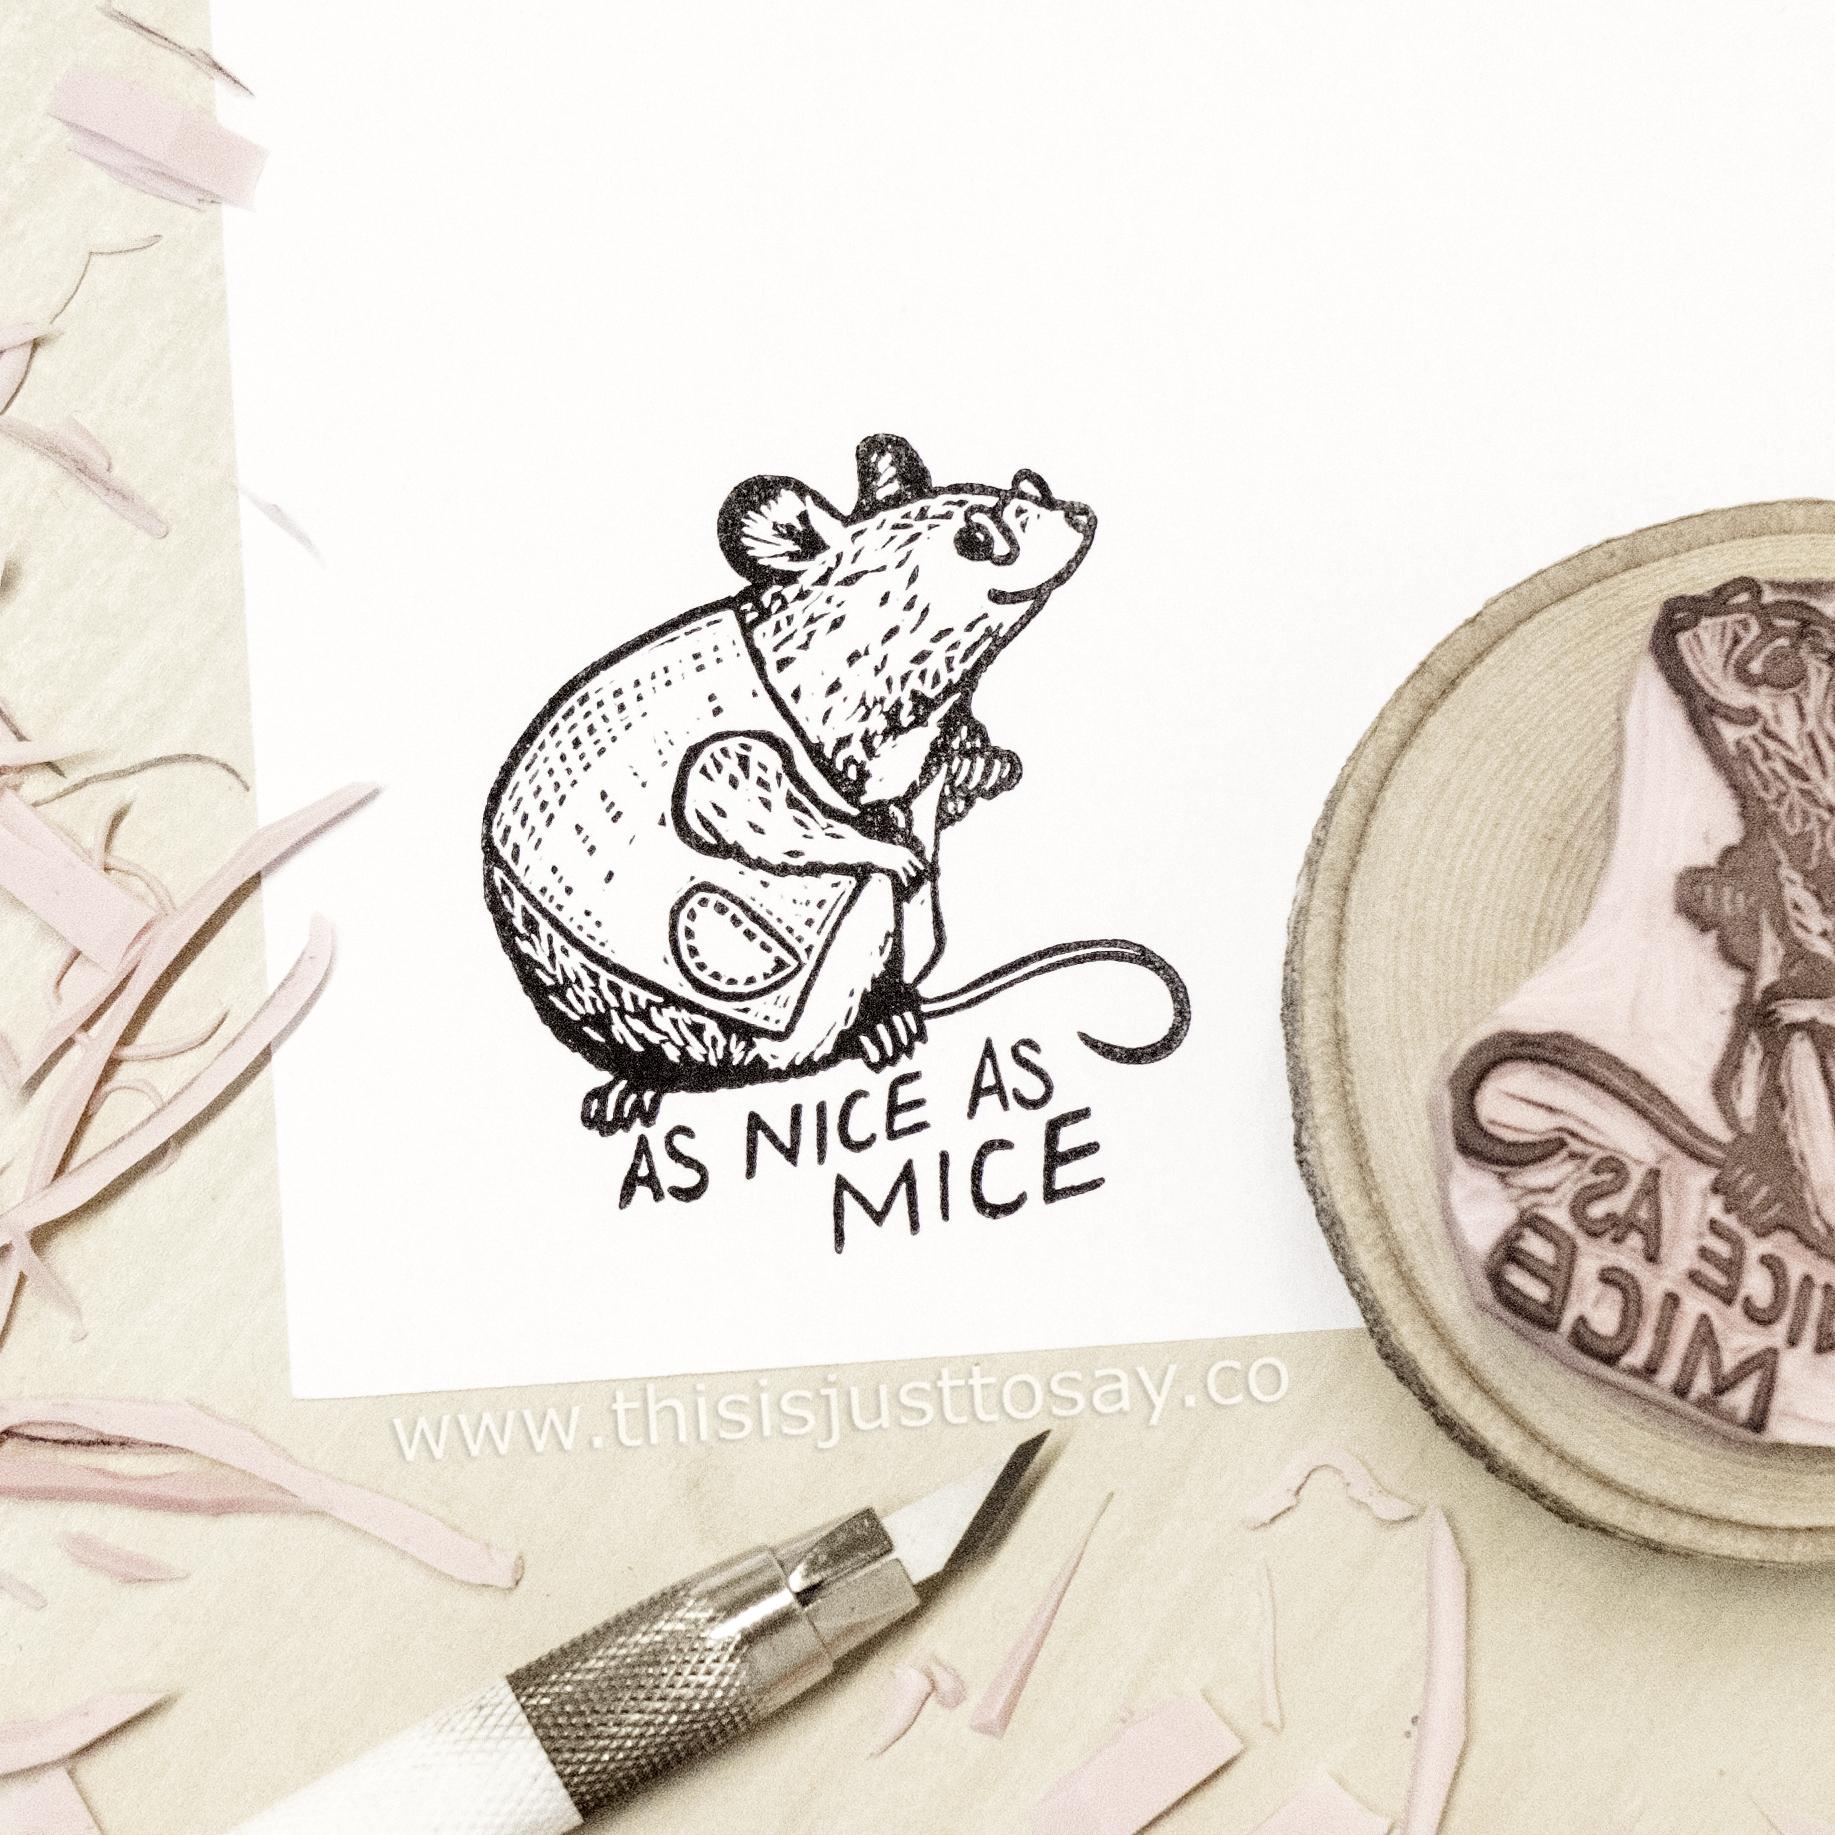 completed-as-nice-as-mice-custom-logo-rubber-stamp.jpg